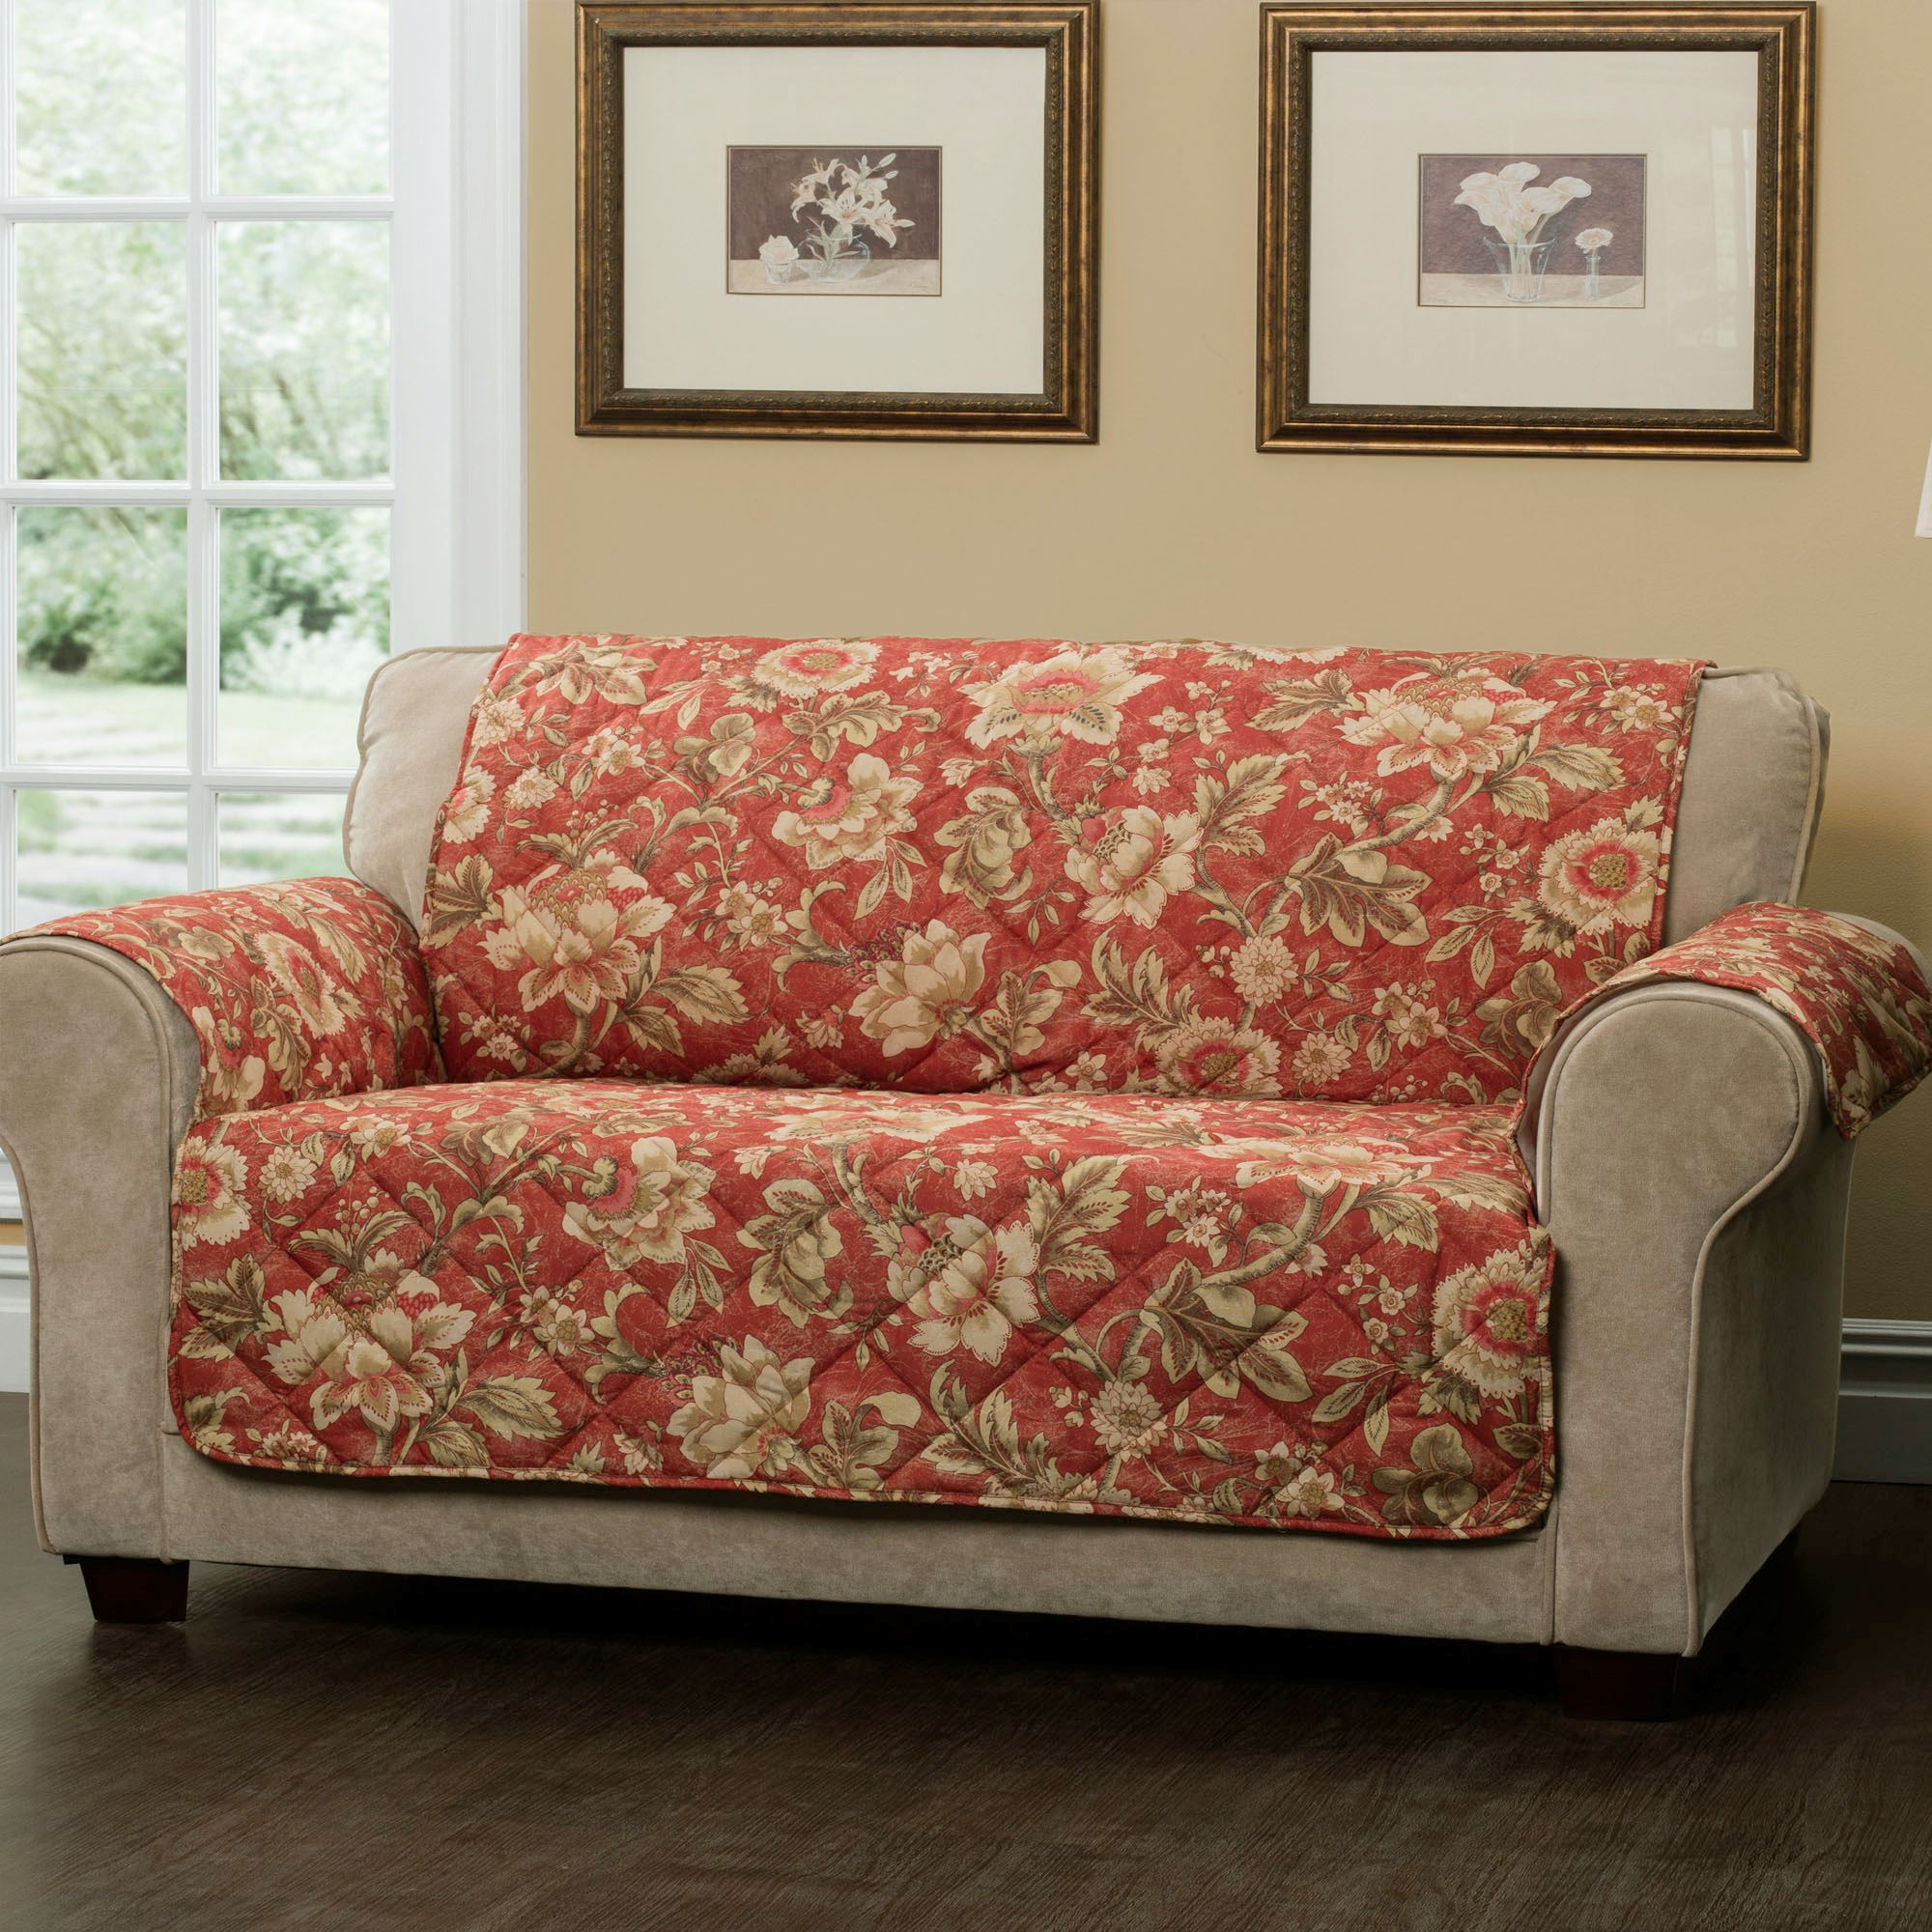 Aviston Furniture Protector Sunset Sofa